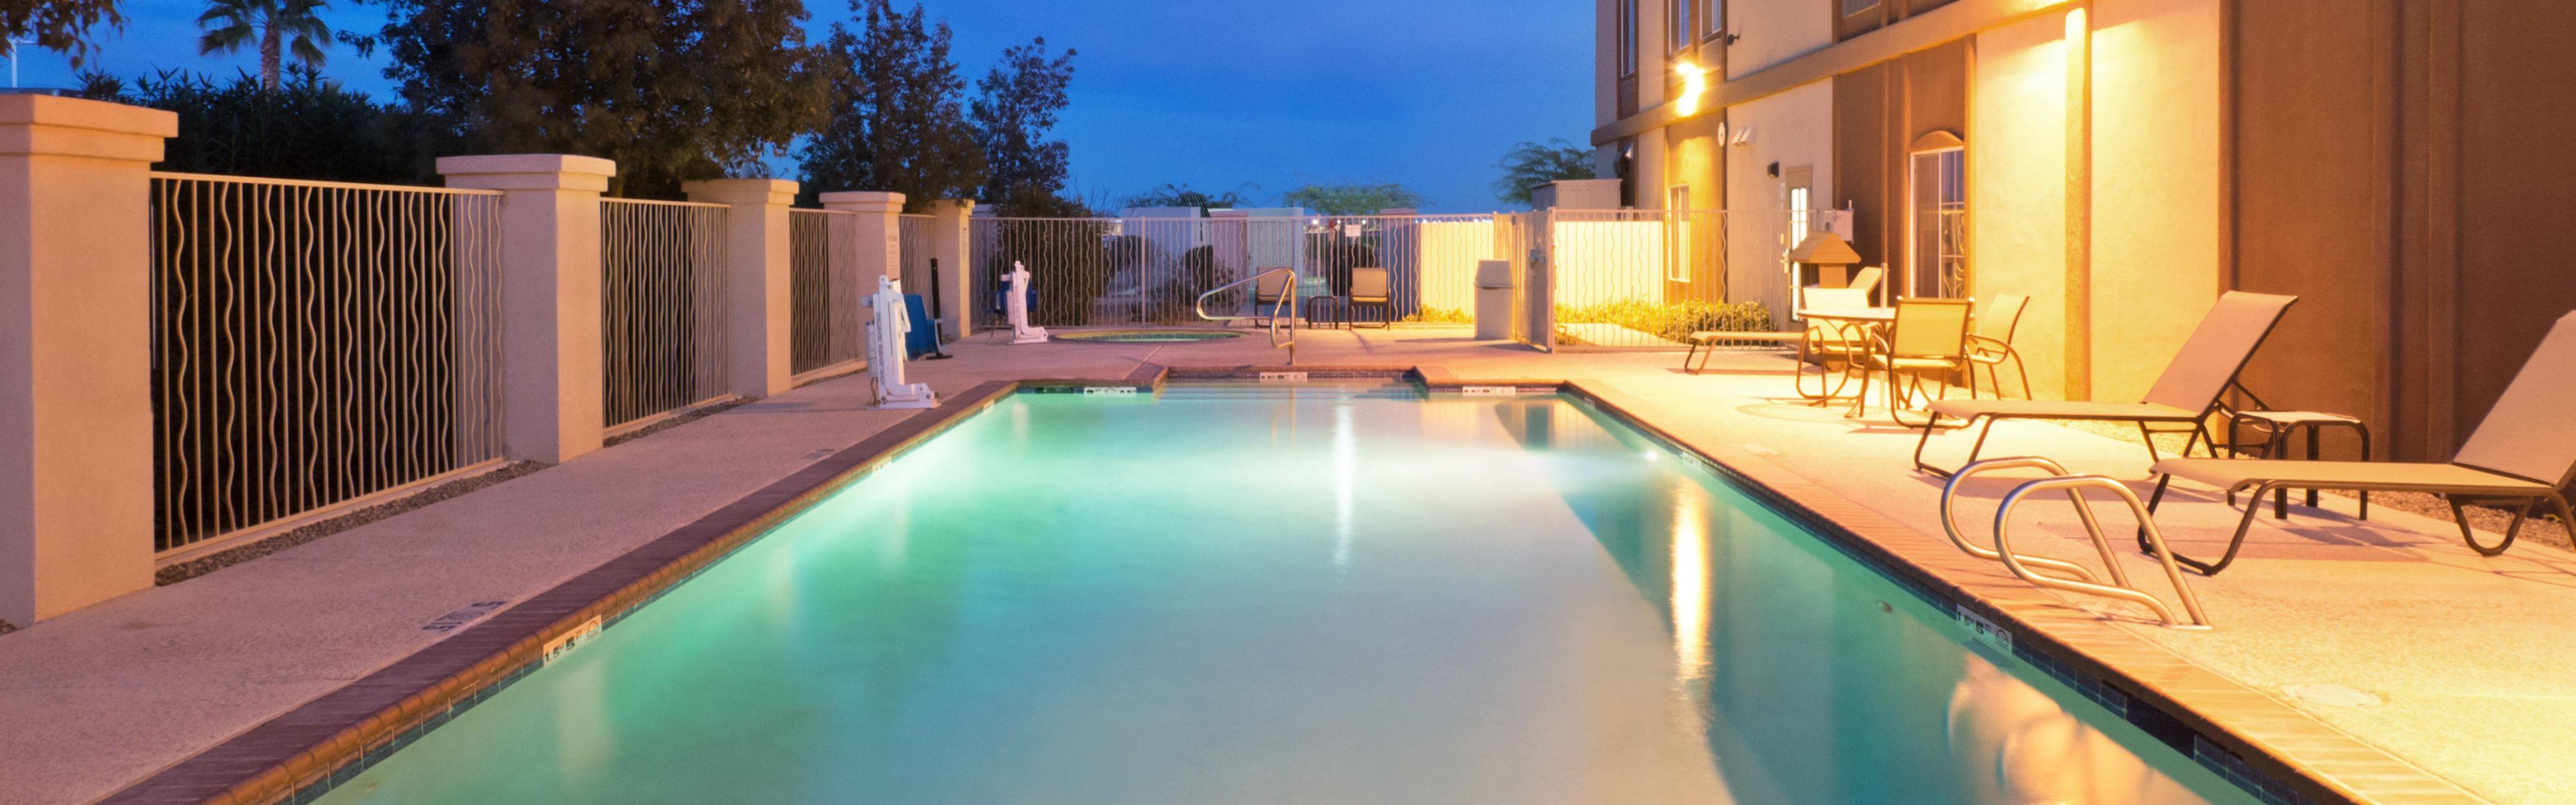 Holiday Inn Express Casa Grande Casa Grande Arizona Az